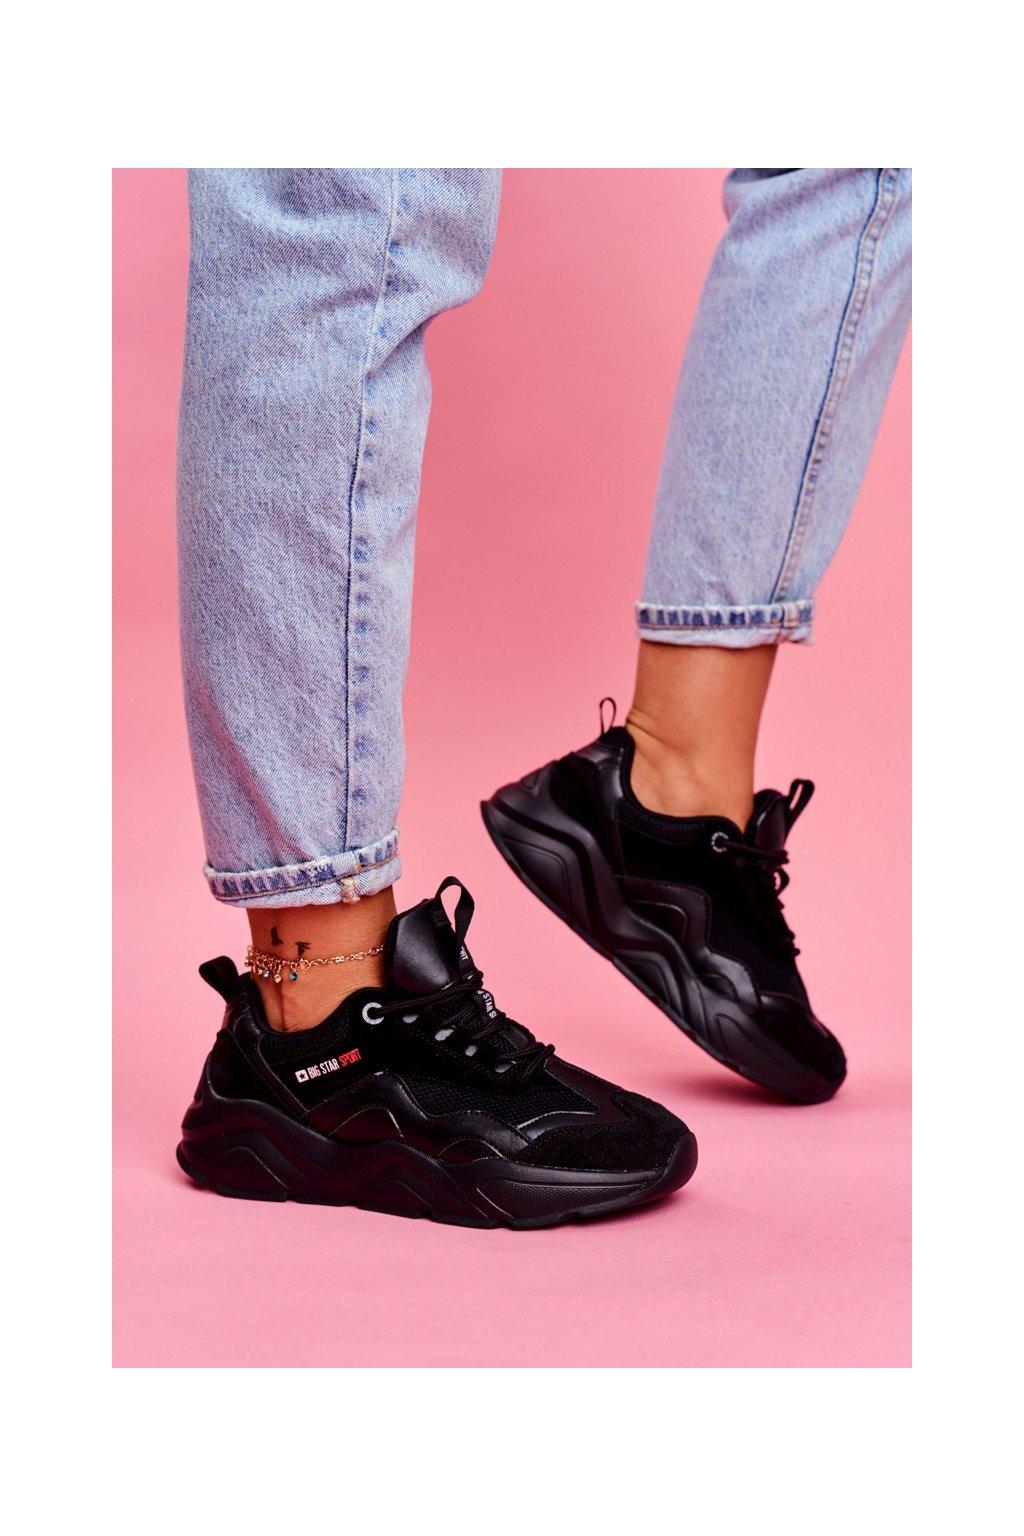 Dámska športová obuv B. Star Čierne FF274959